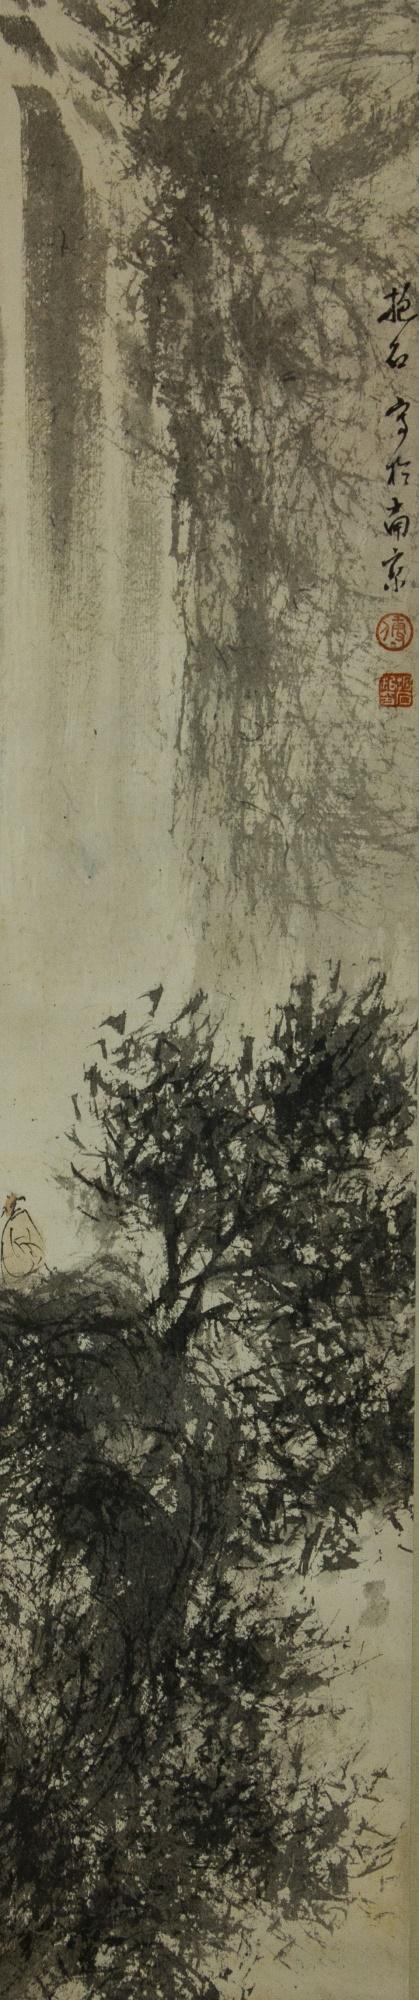 Fu Baoshi 1904-1965 Watercolour on Paper Scroll